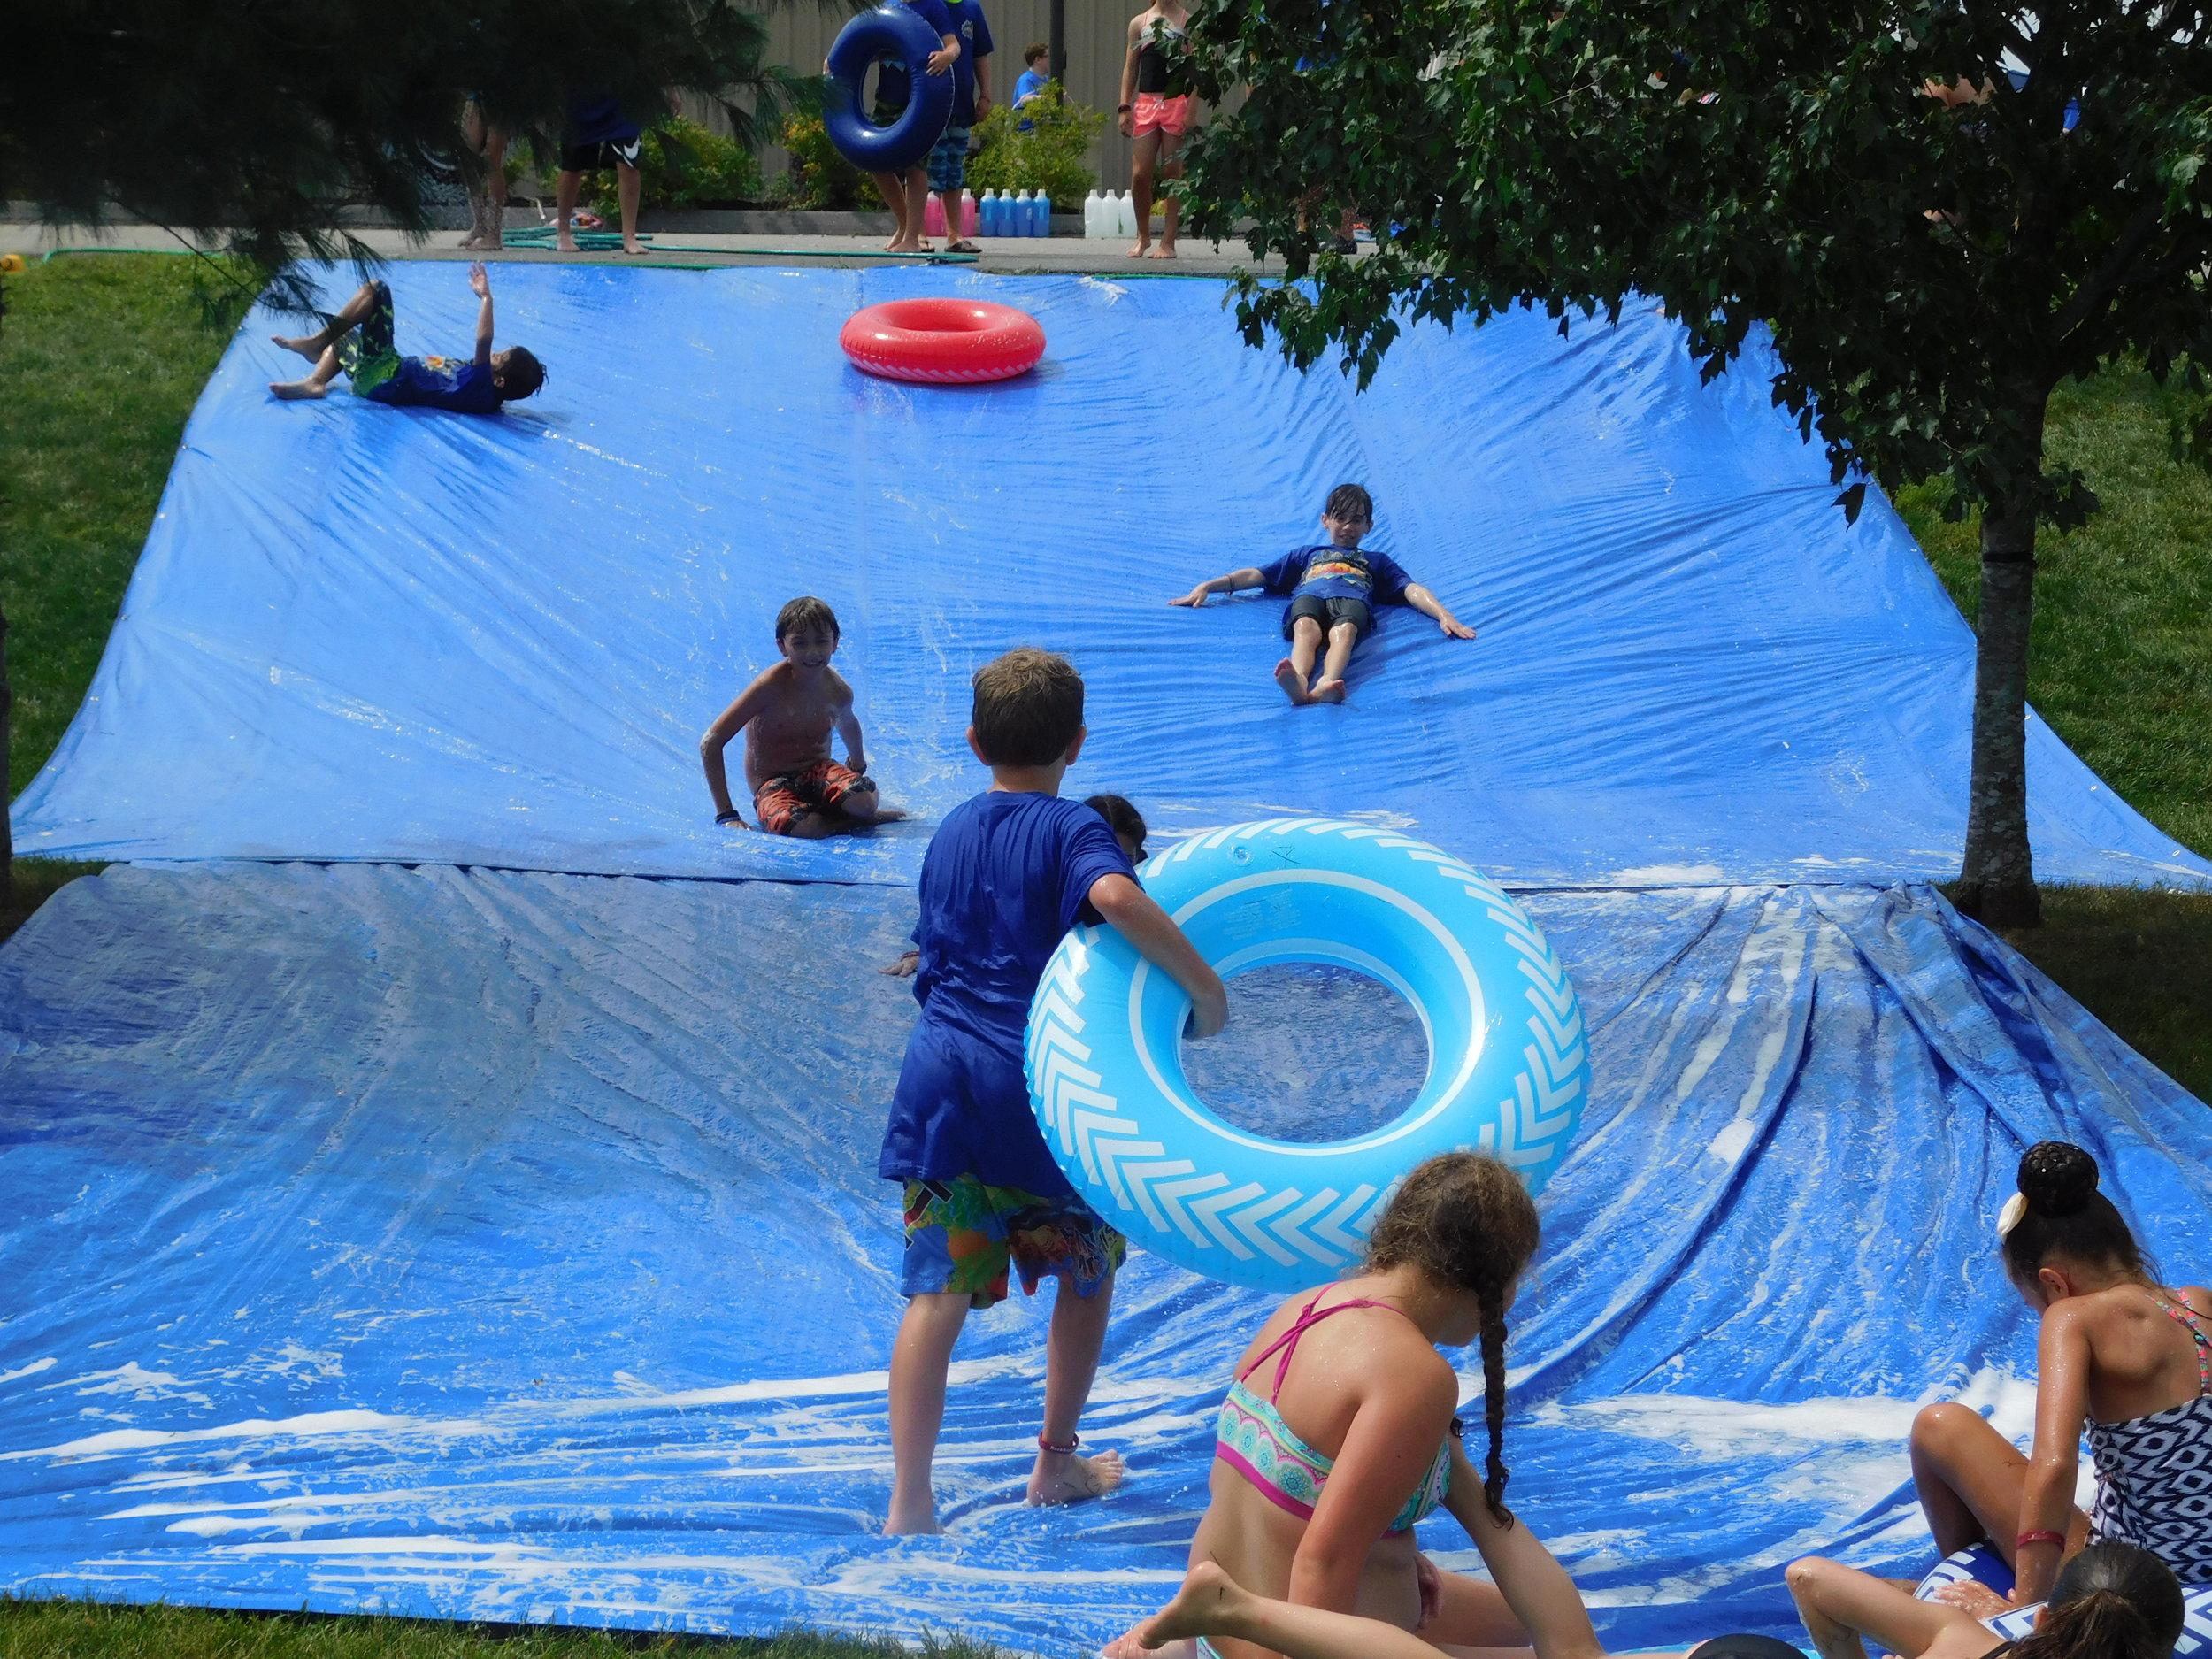 Day Camp Aug 13-17 & Aug 20-24